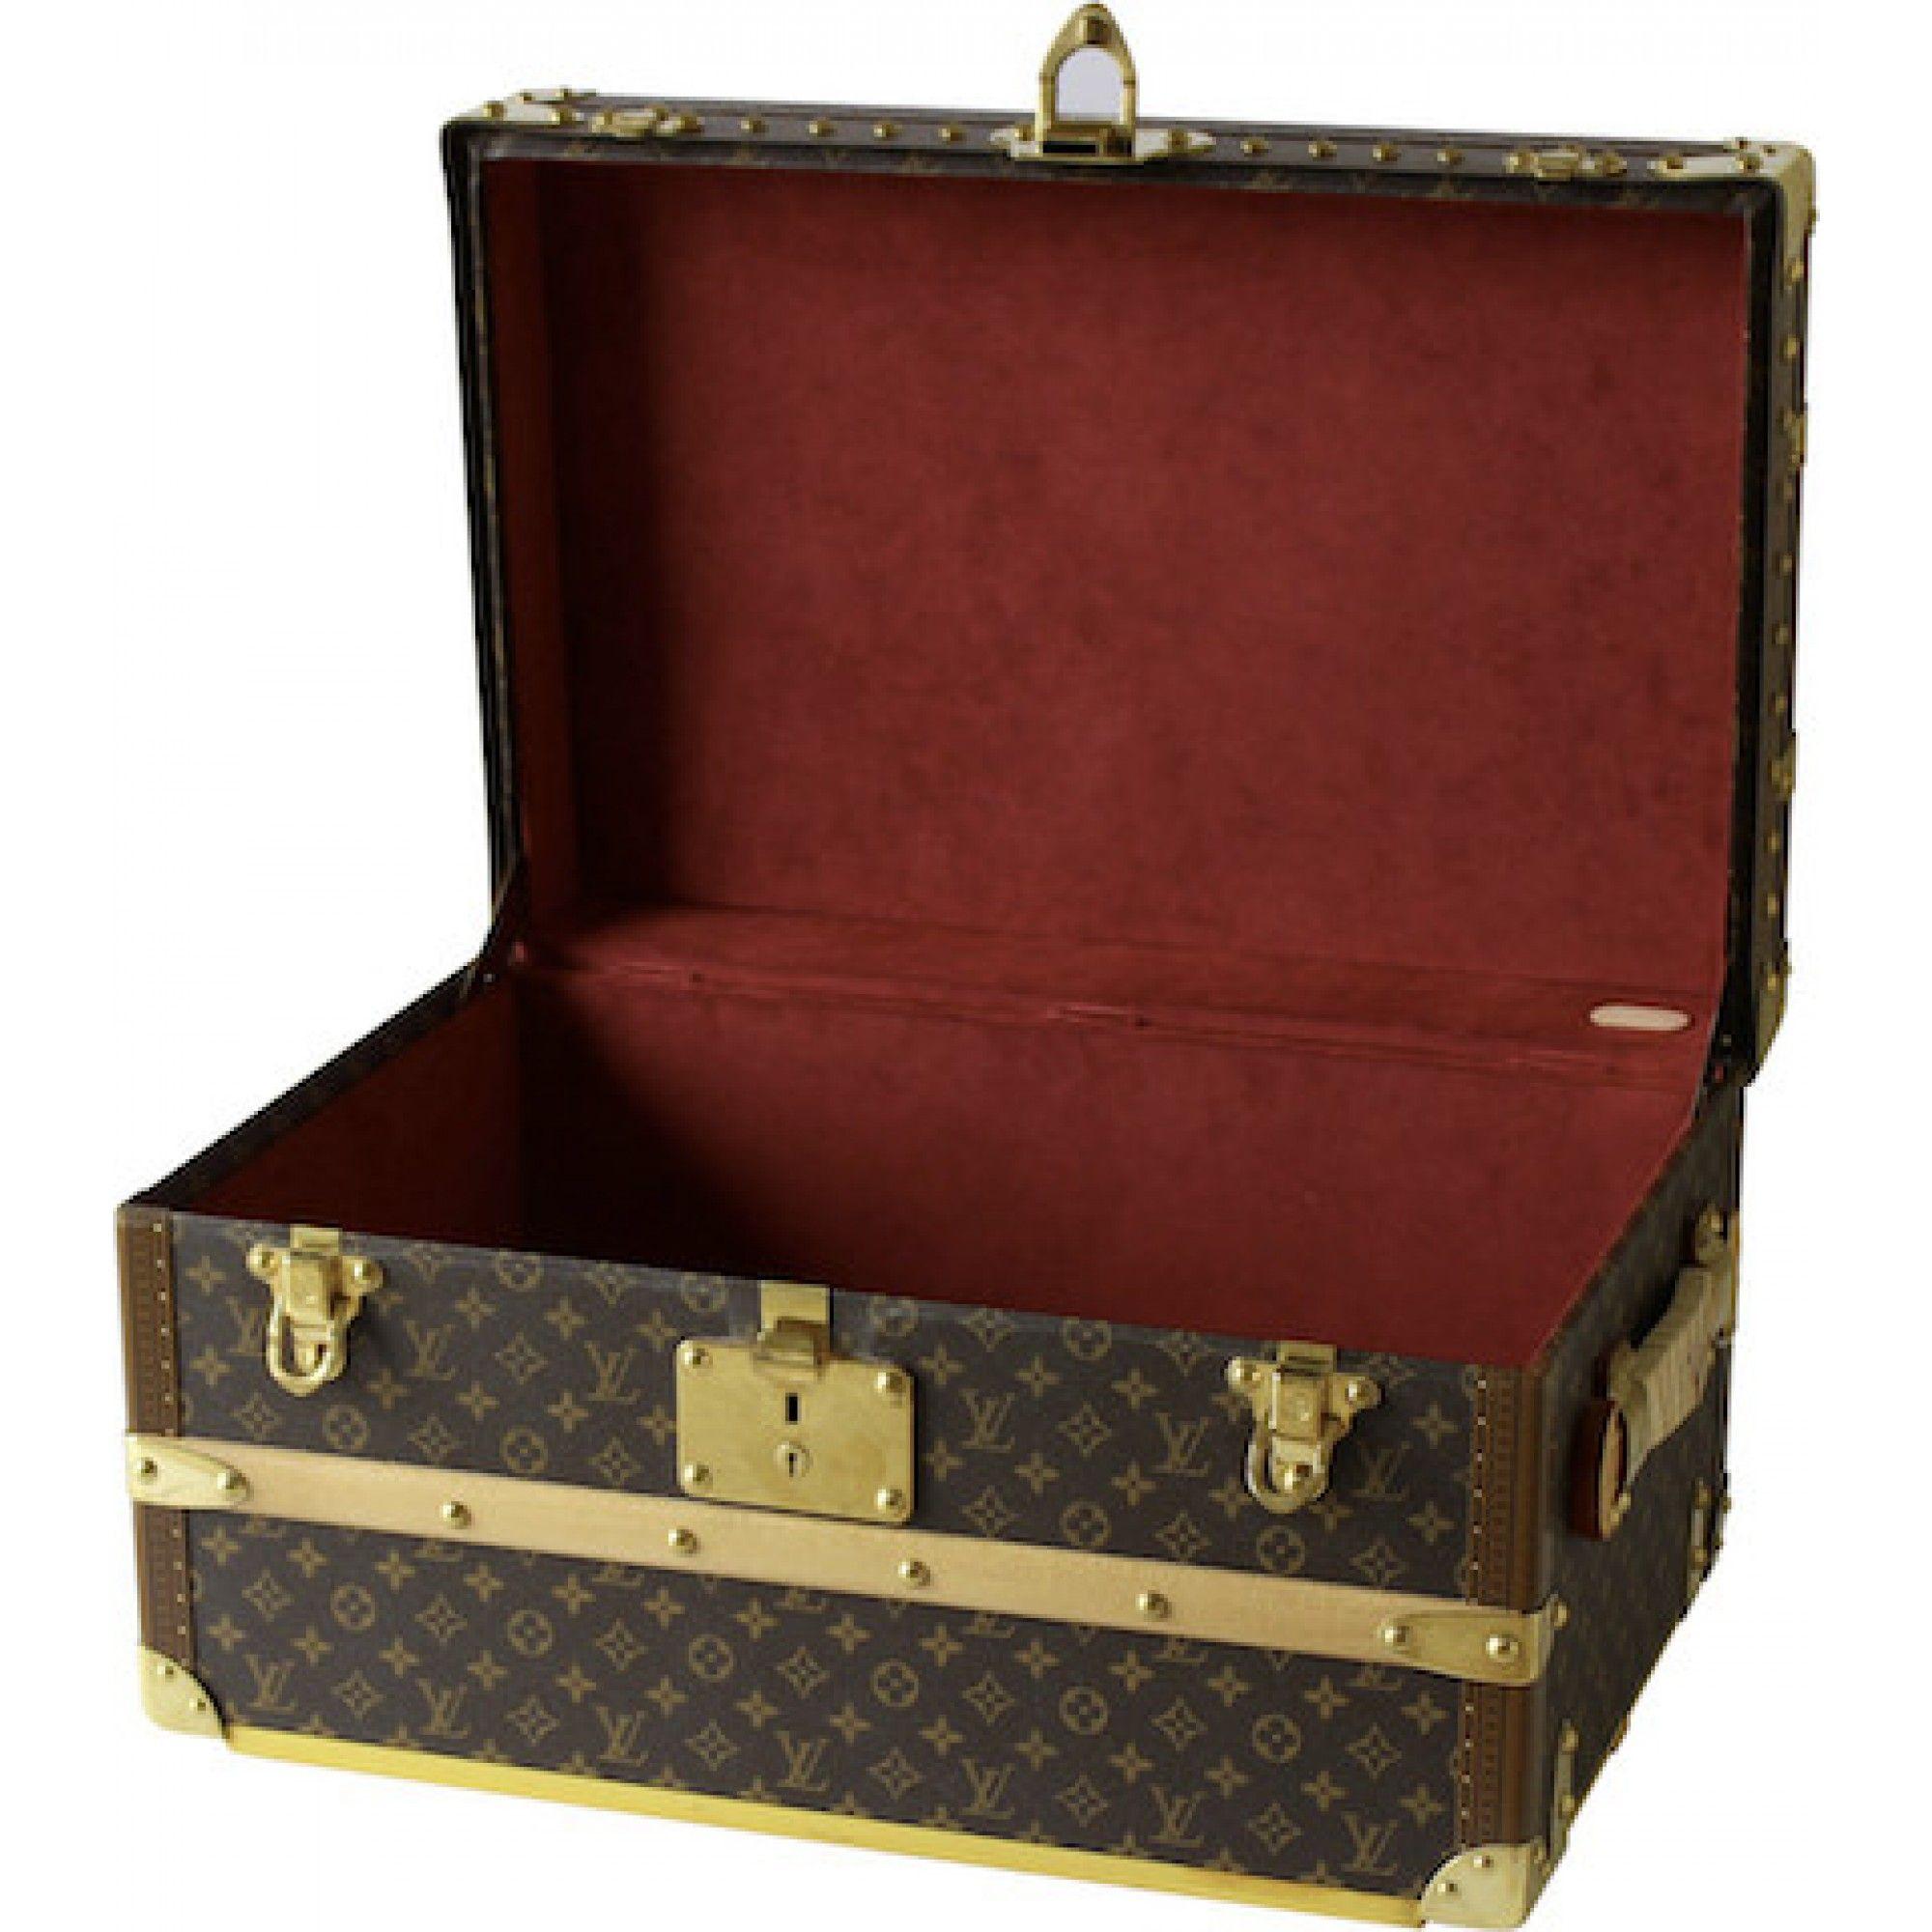 Louis Vuitton Mini Cabin Trunk with Red Velvet Interior - Louis ...